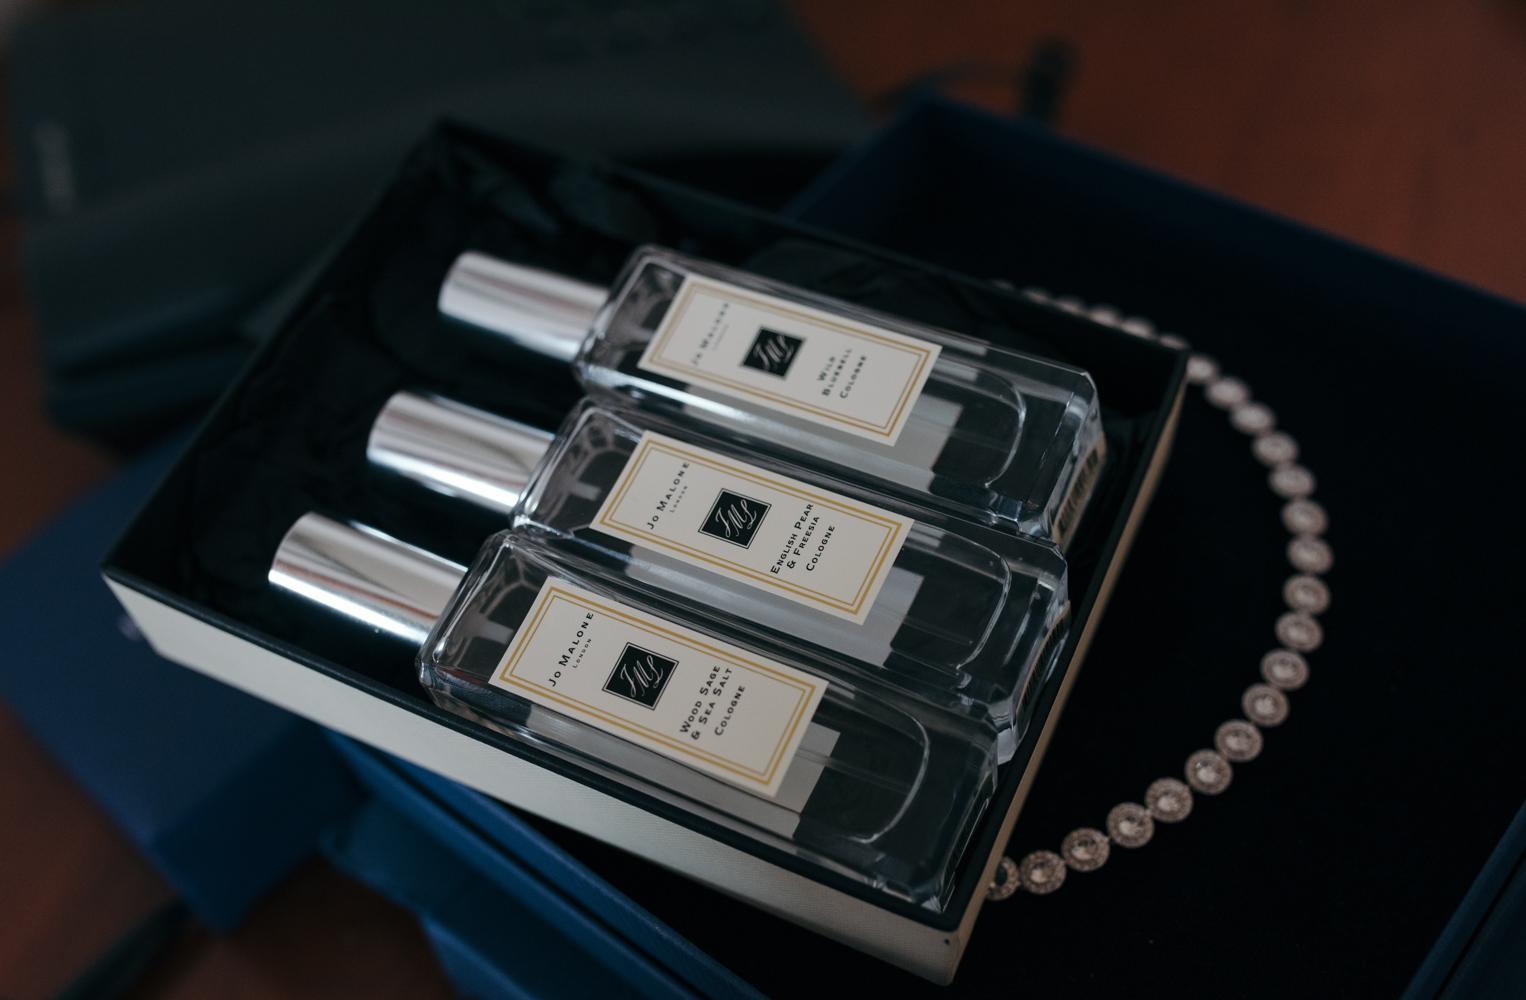 Joe Malone perfume for the bride and bridesmaids